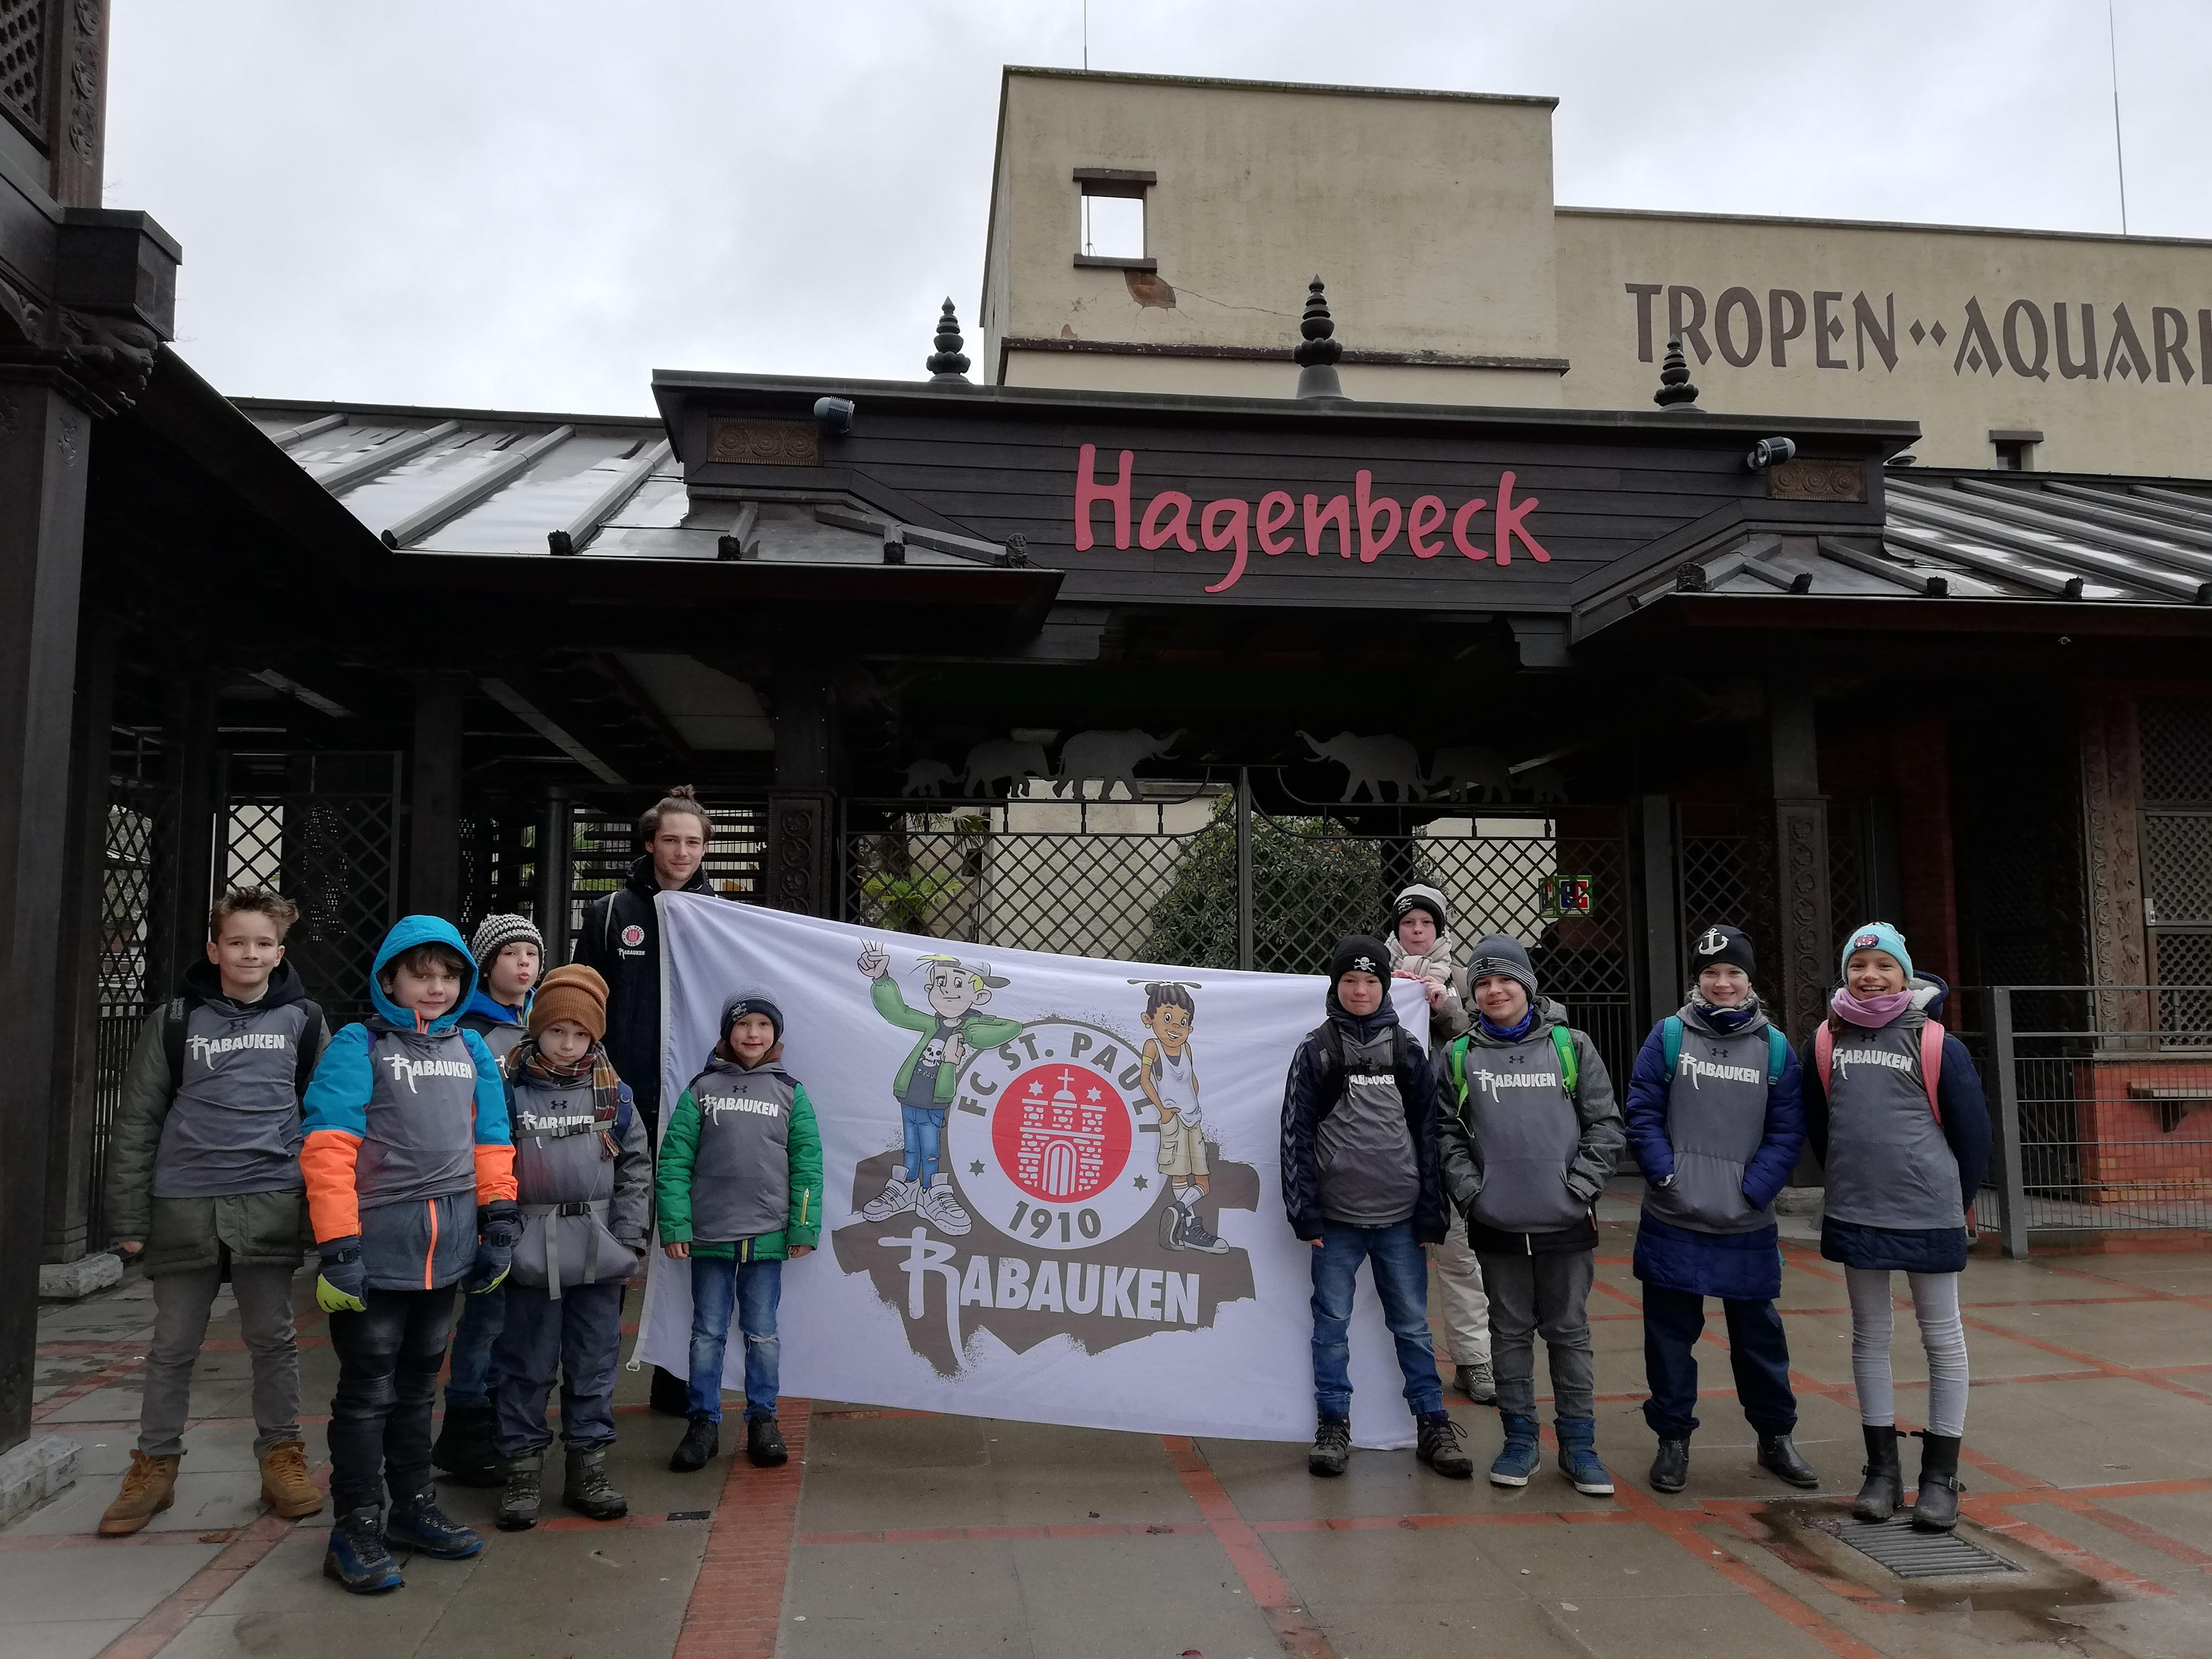 Rabauken als Polarforscher im Tierpark Hagenbeck